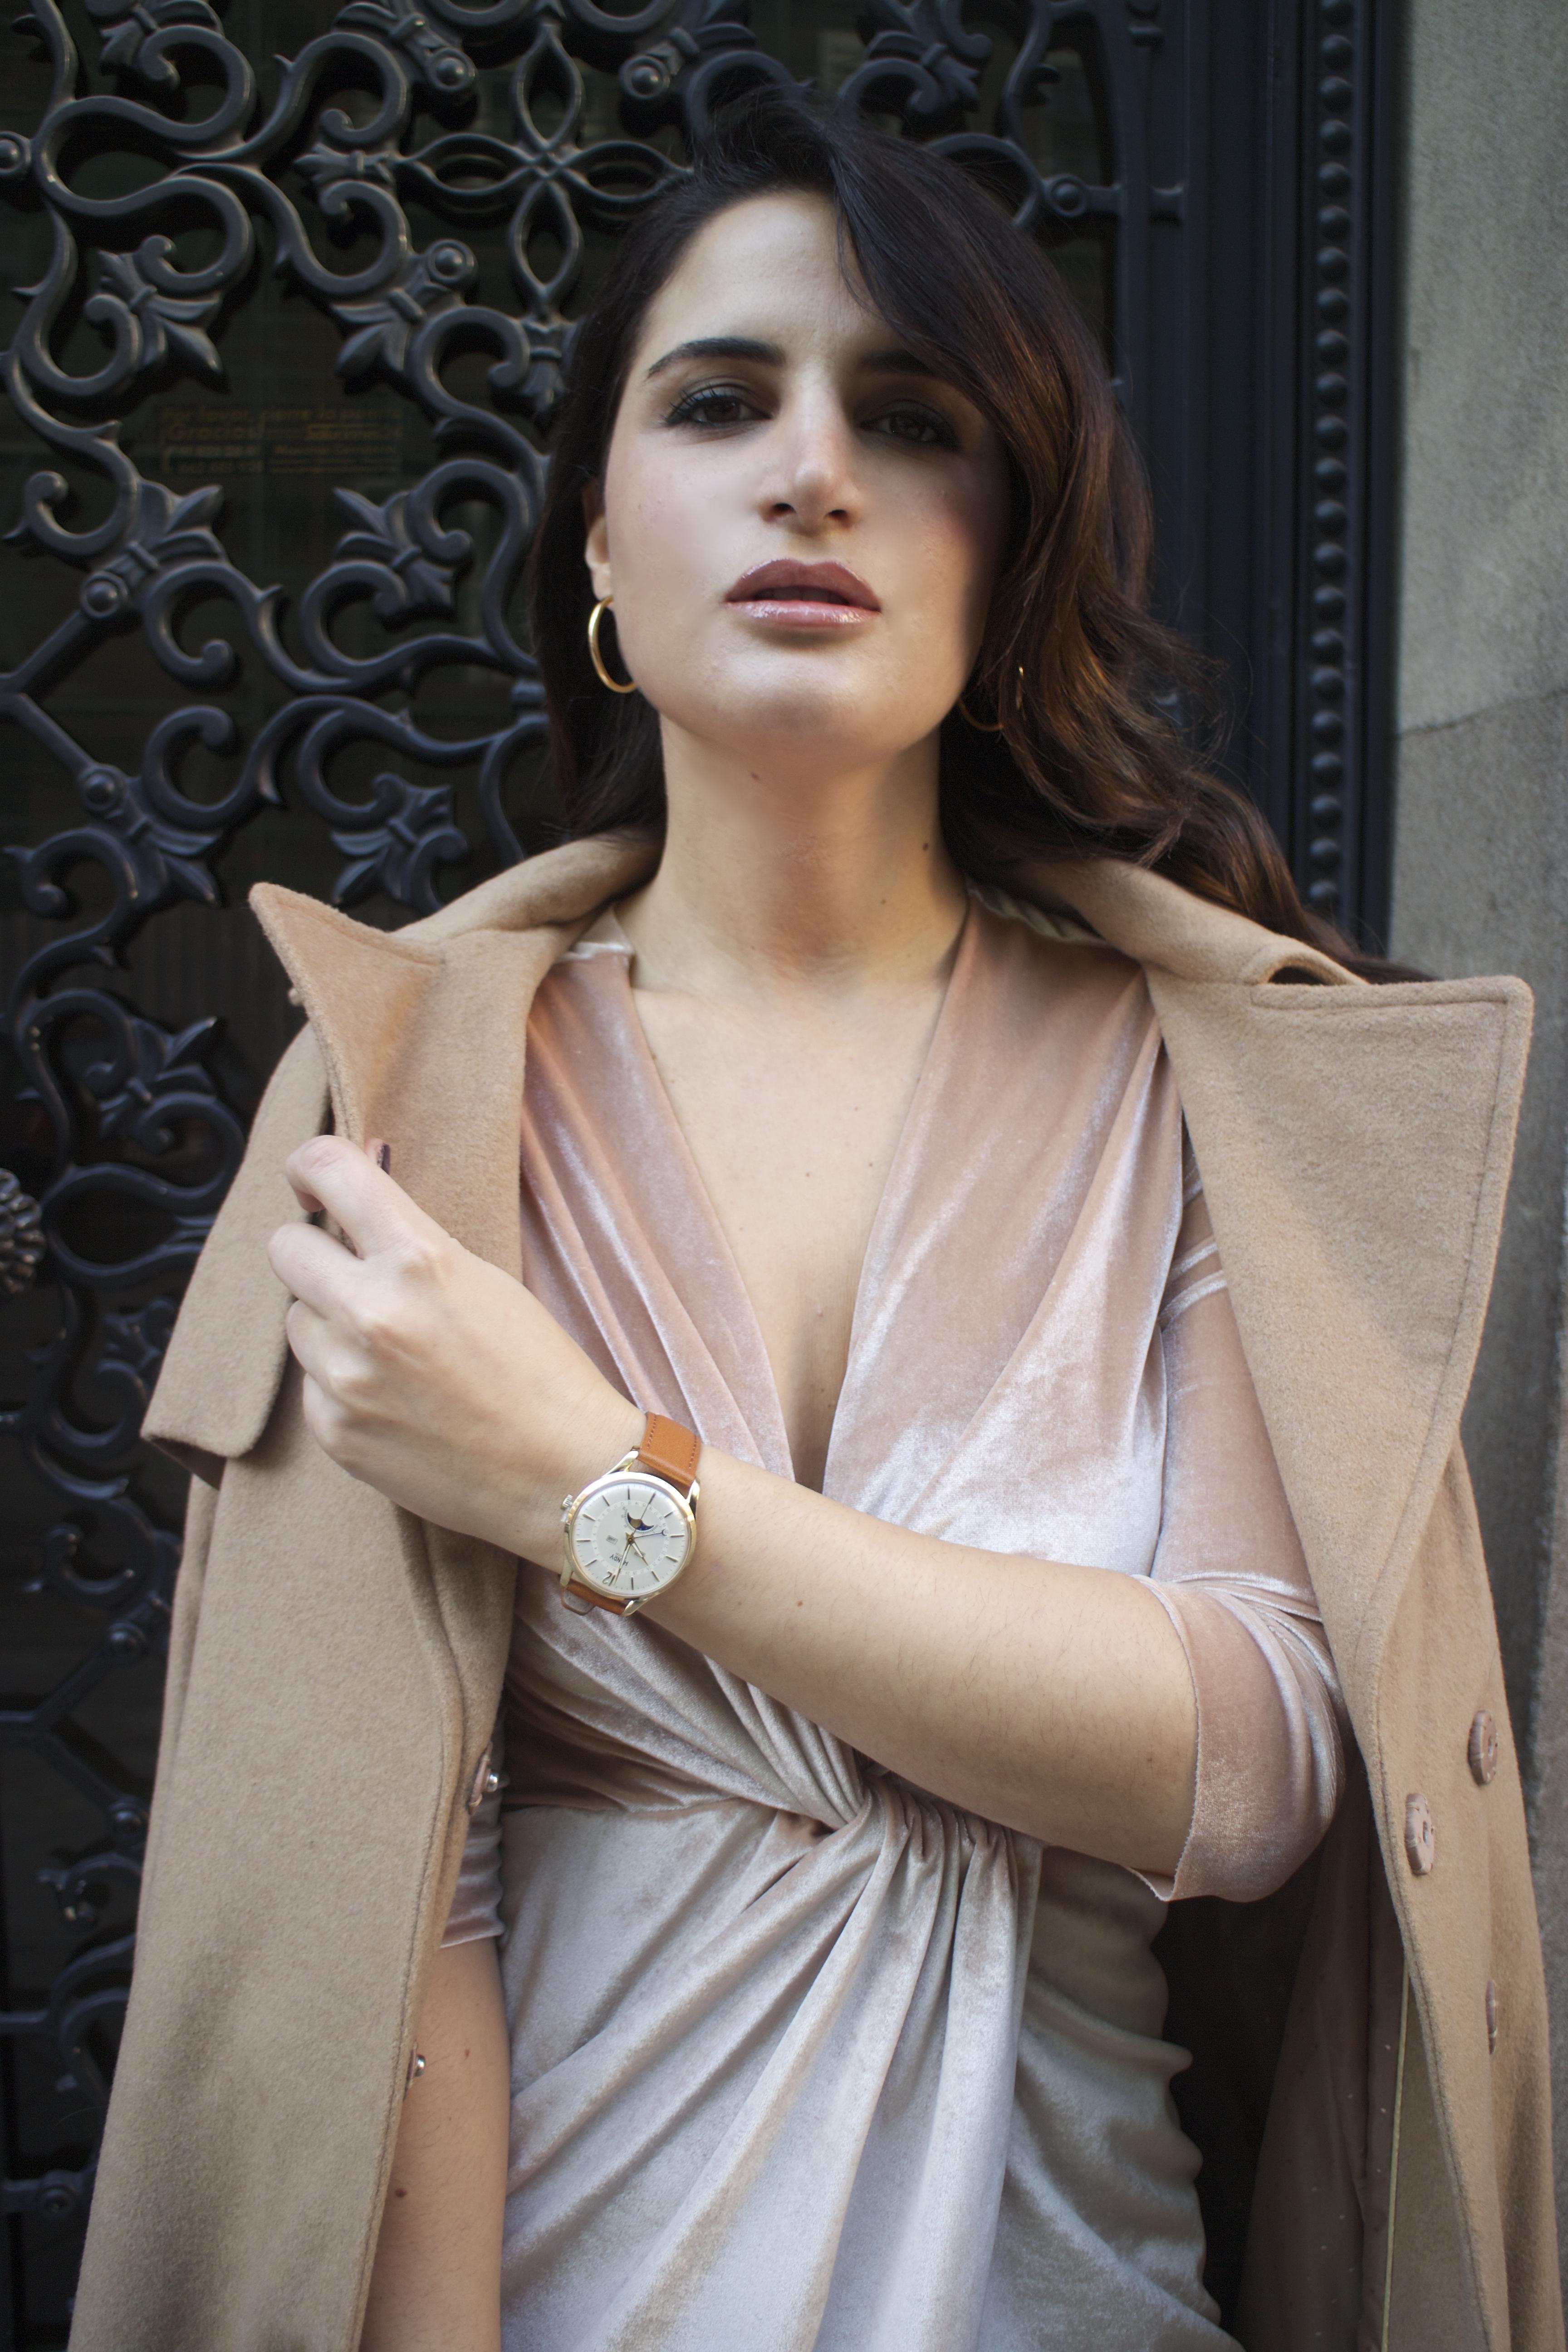 henry-london-watch-brand-embassador-pink-velvet-dress-vuitton-bag-lady-amaras-la-moda-paula-fraile2